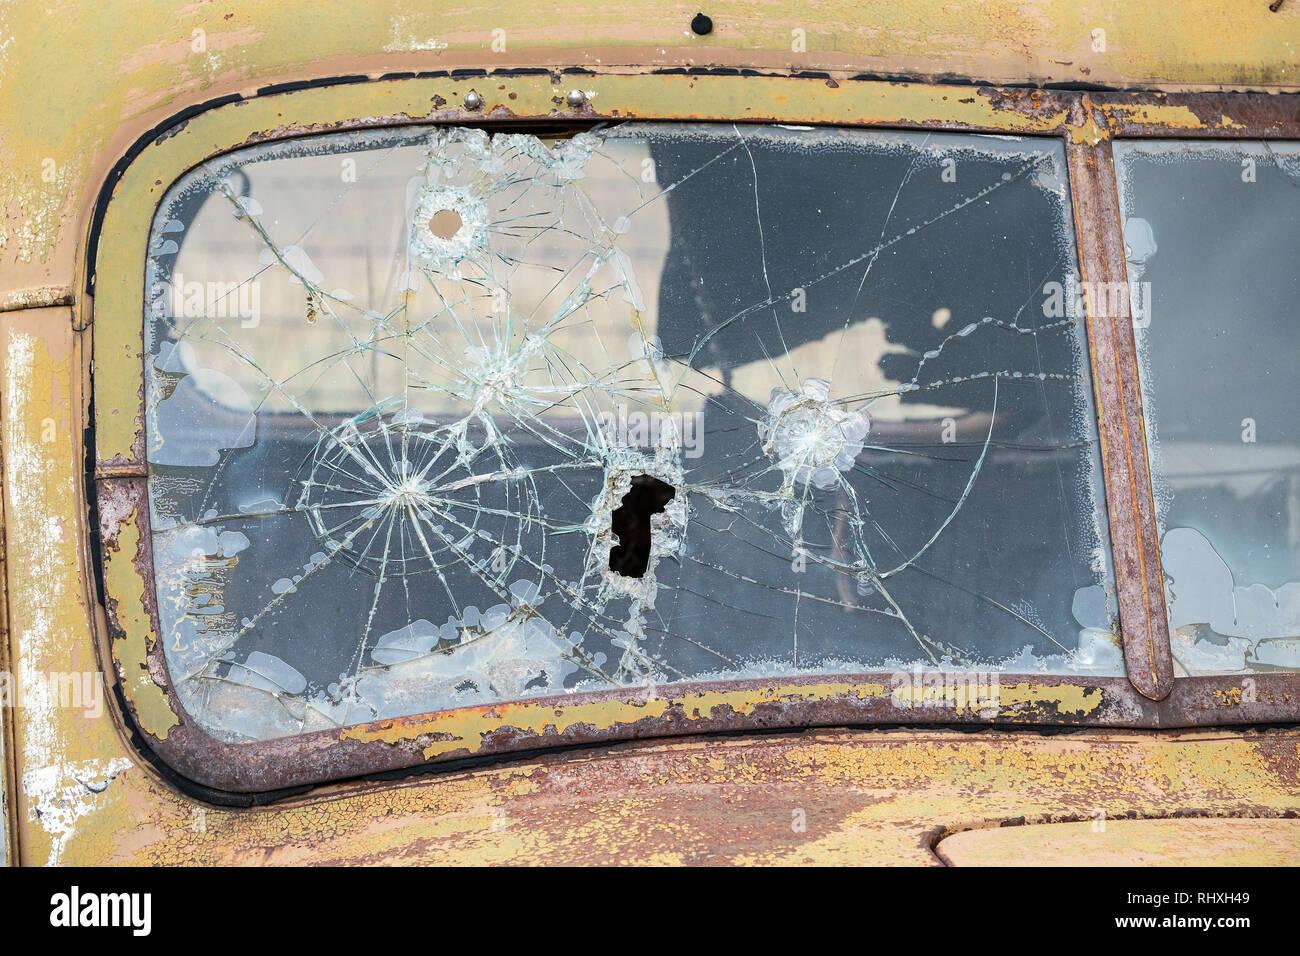 Old International Truck Stock Photos & Old International